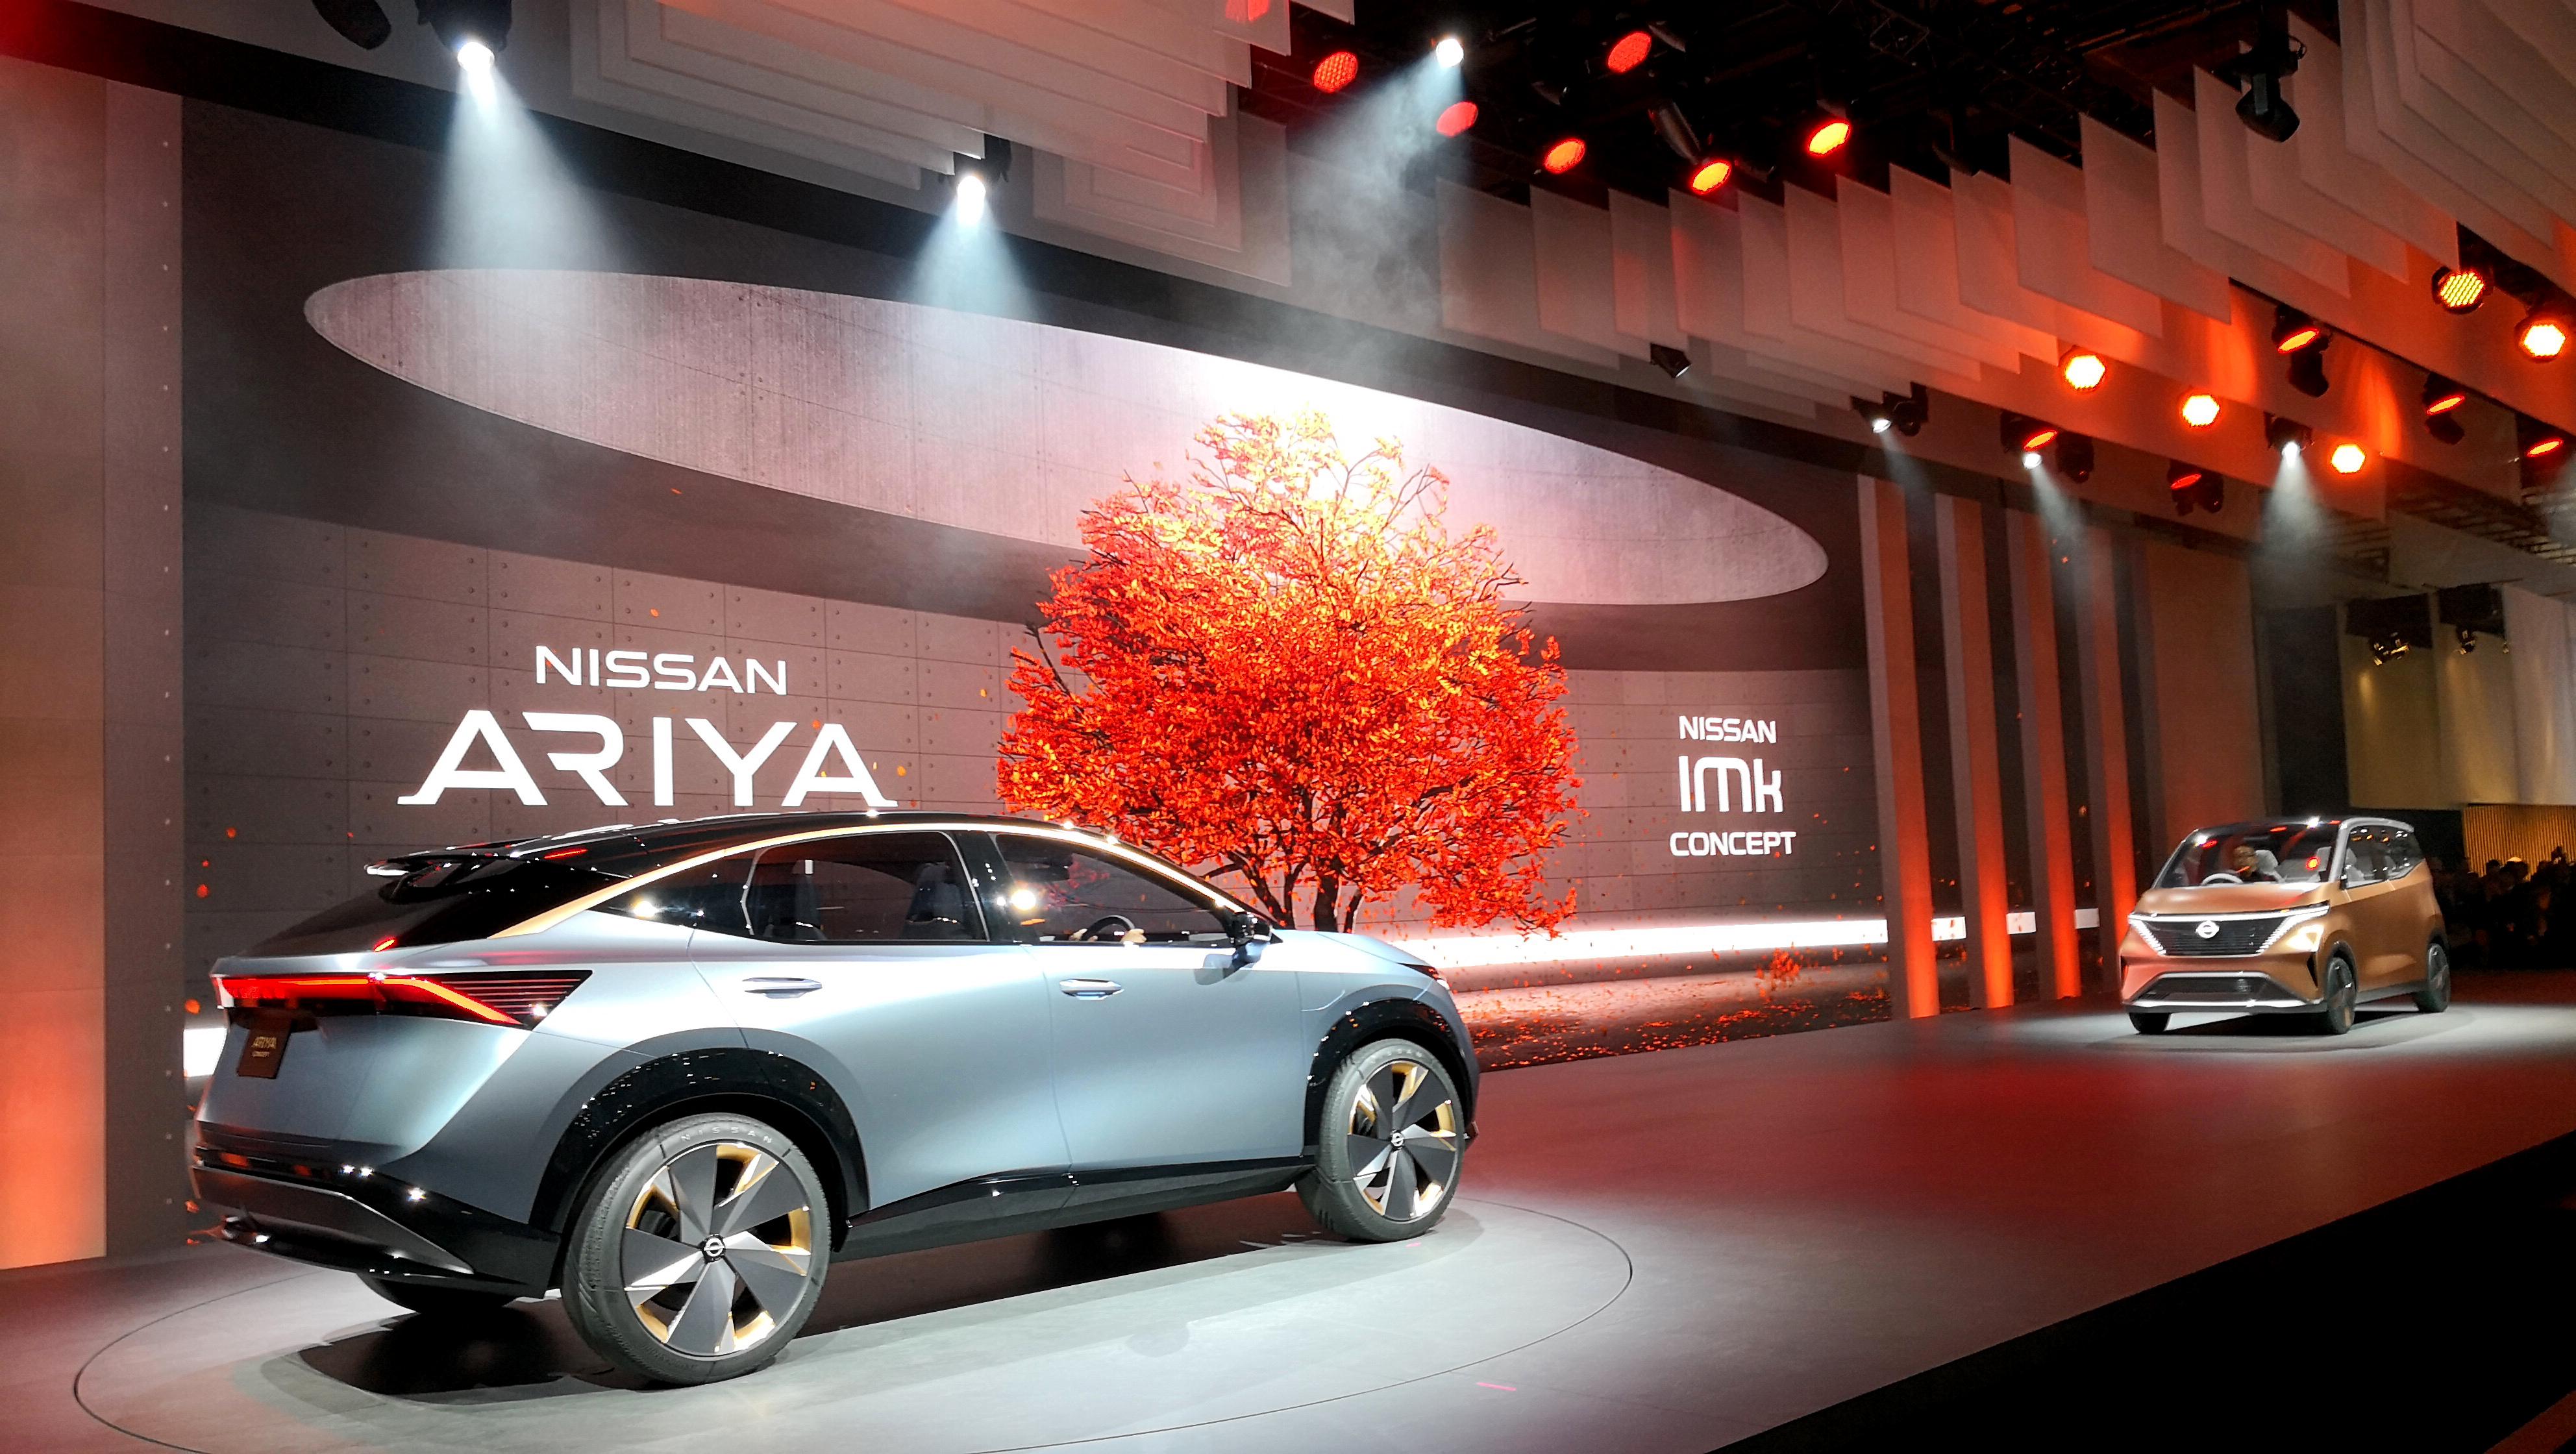 Nissan Ariya and IMk